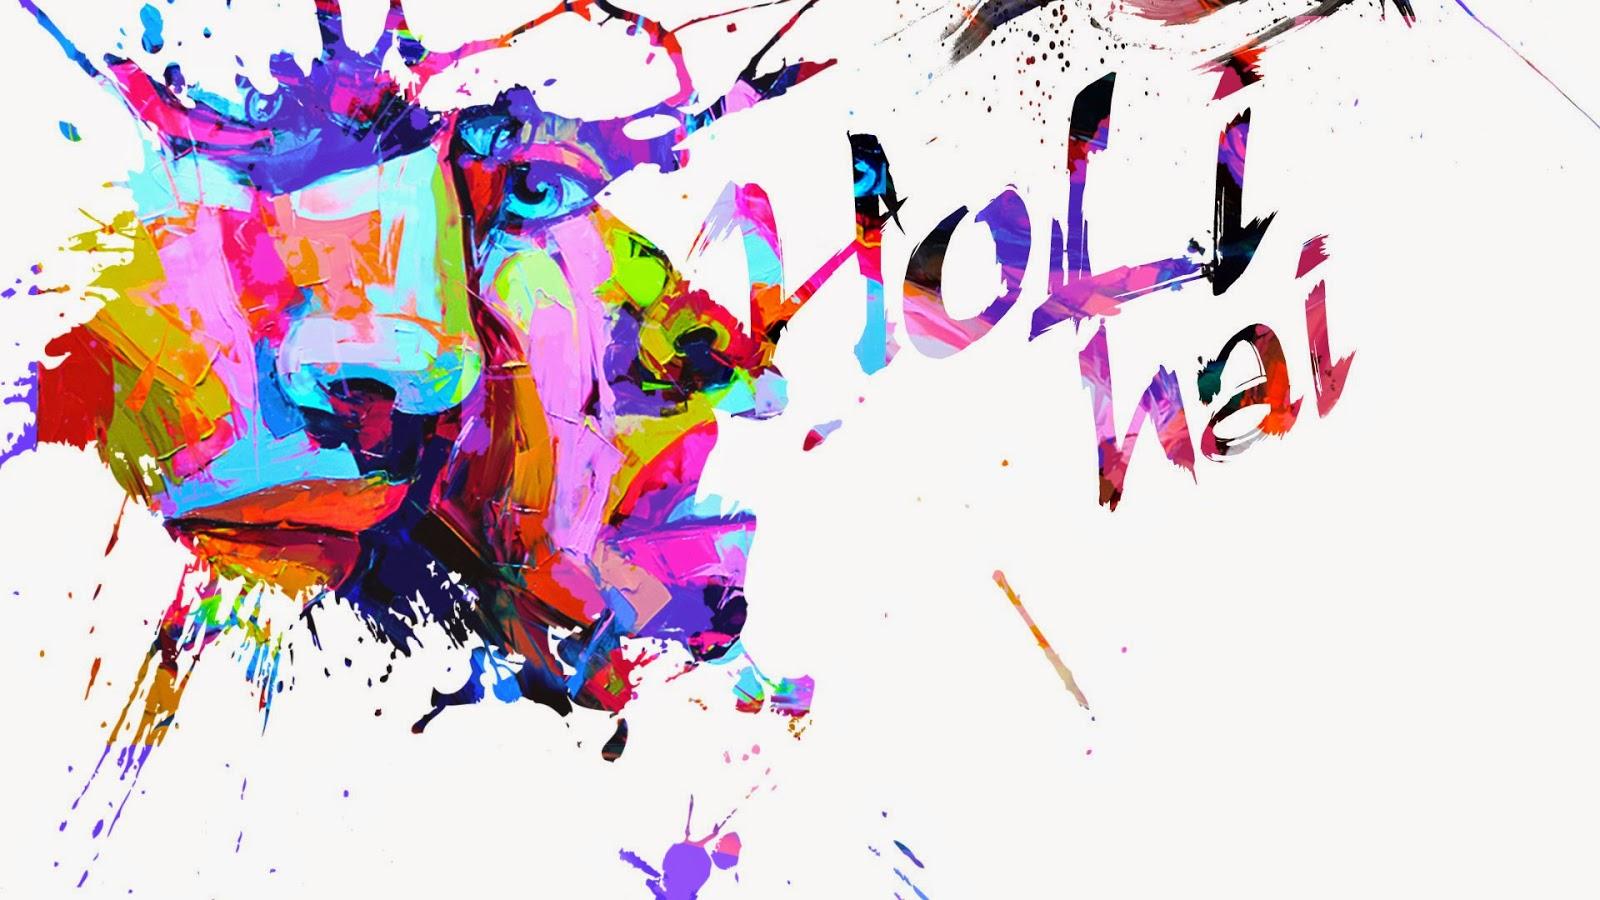 Holi Wallpapers Holi WallpapersDownload Holi 1600x900